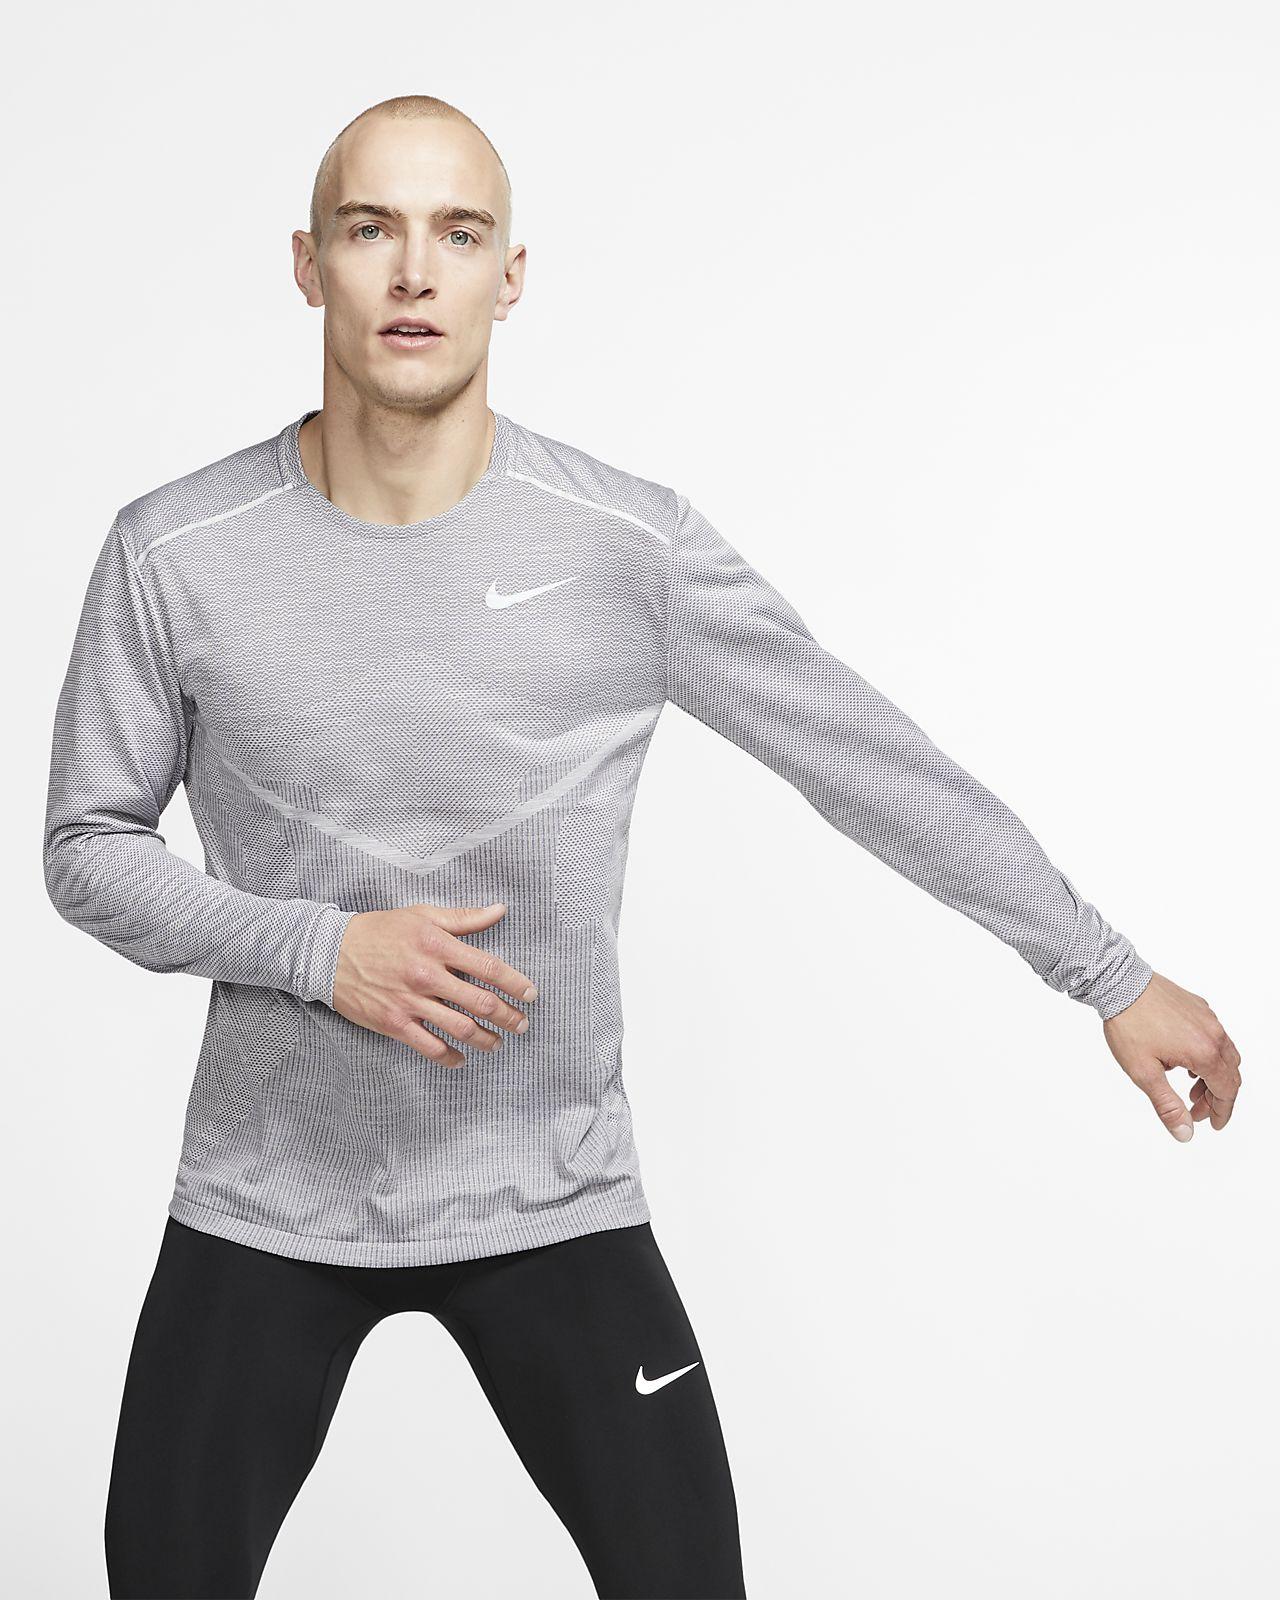 Camisola de running de manga comprida Nike TechKnit Ultra para homem